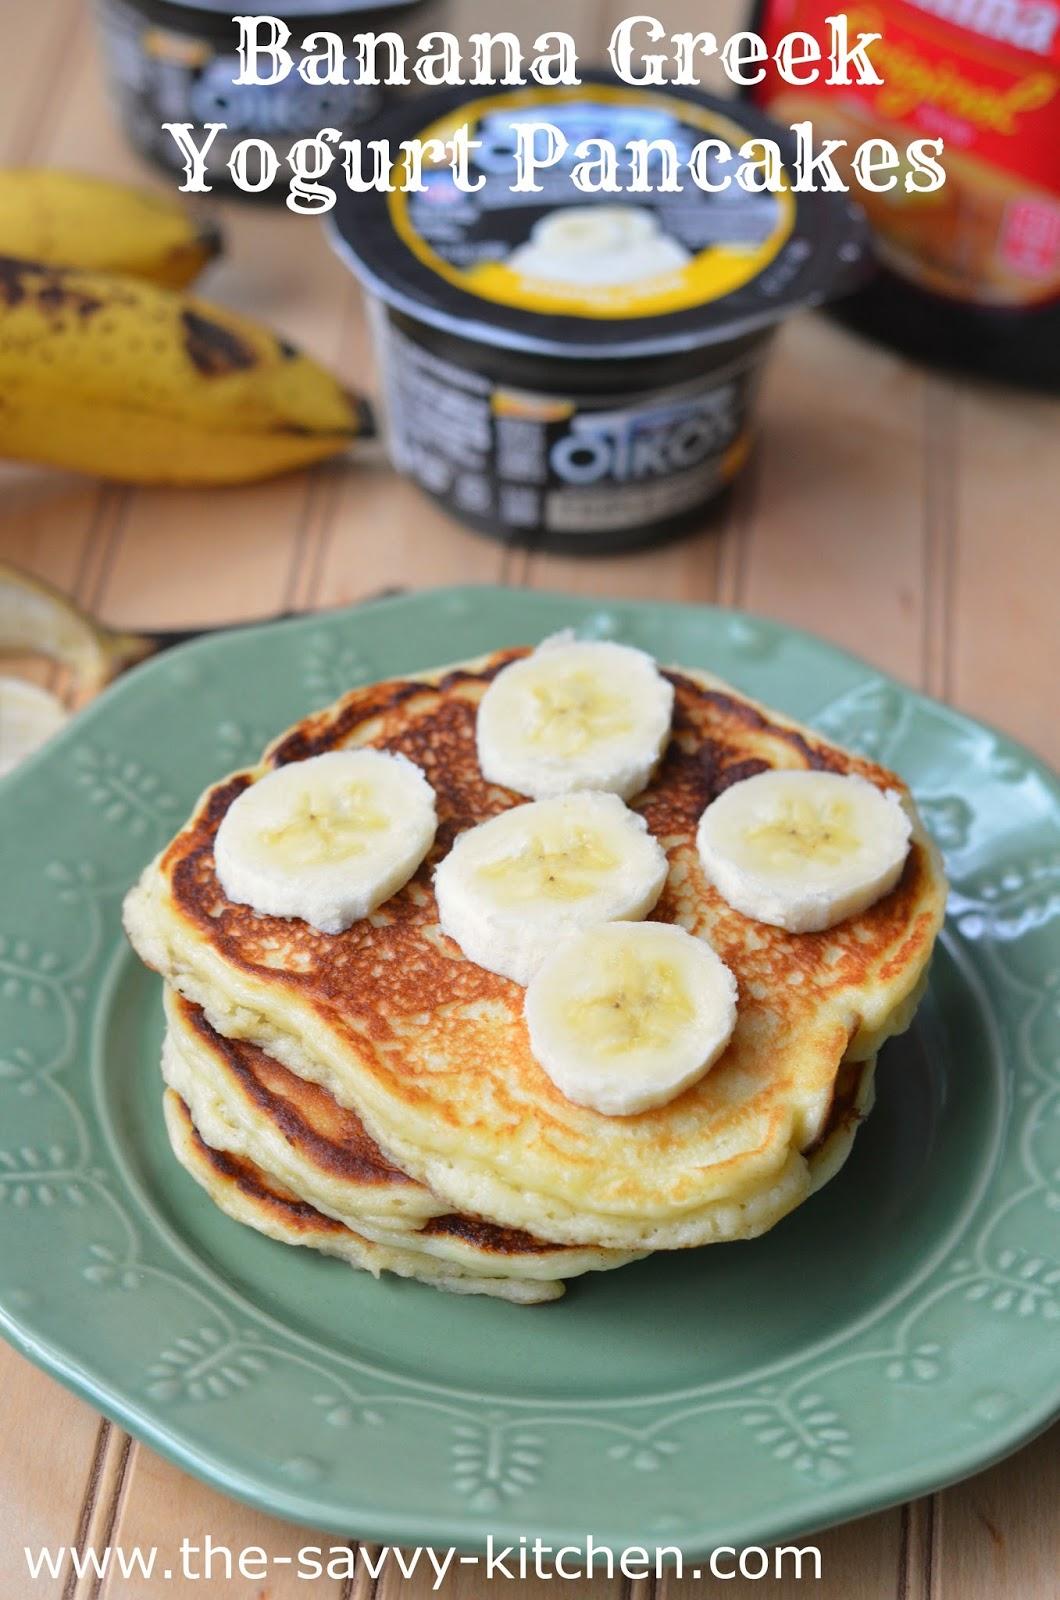 The Savvy Kitchen: Banana Greek Yogurt Pancakes